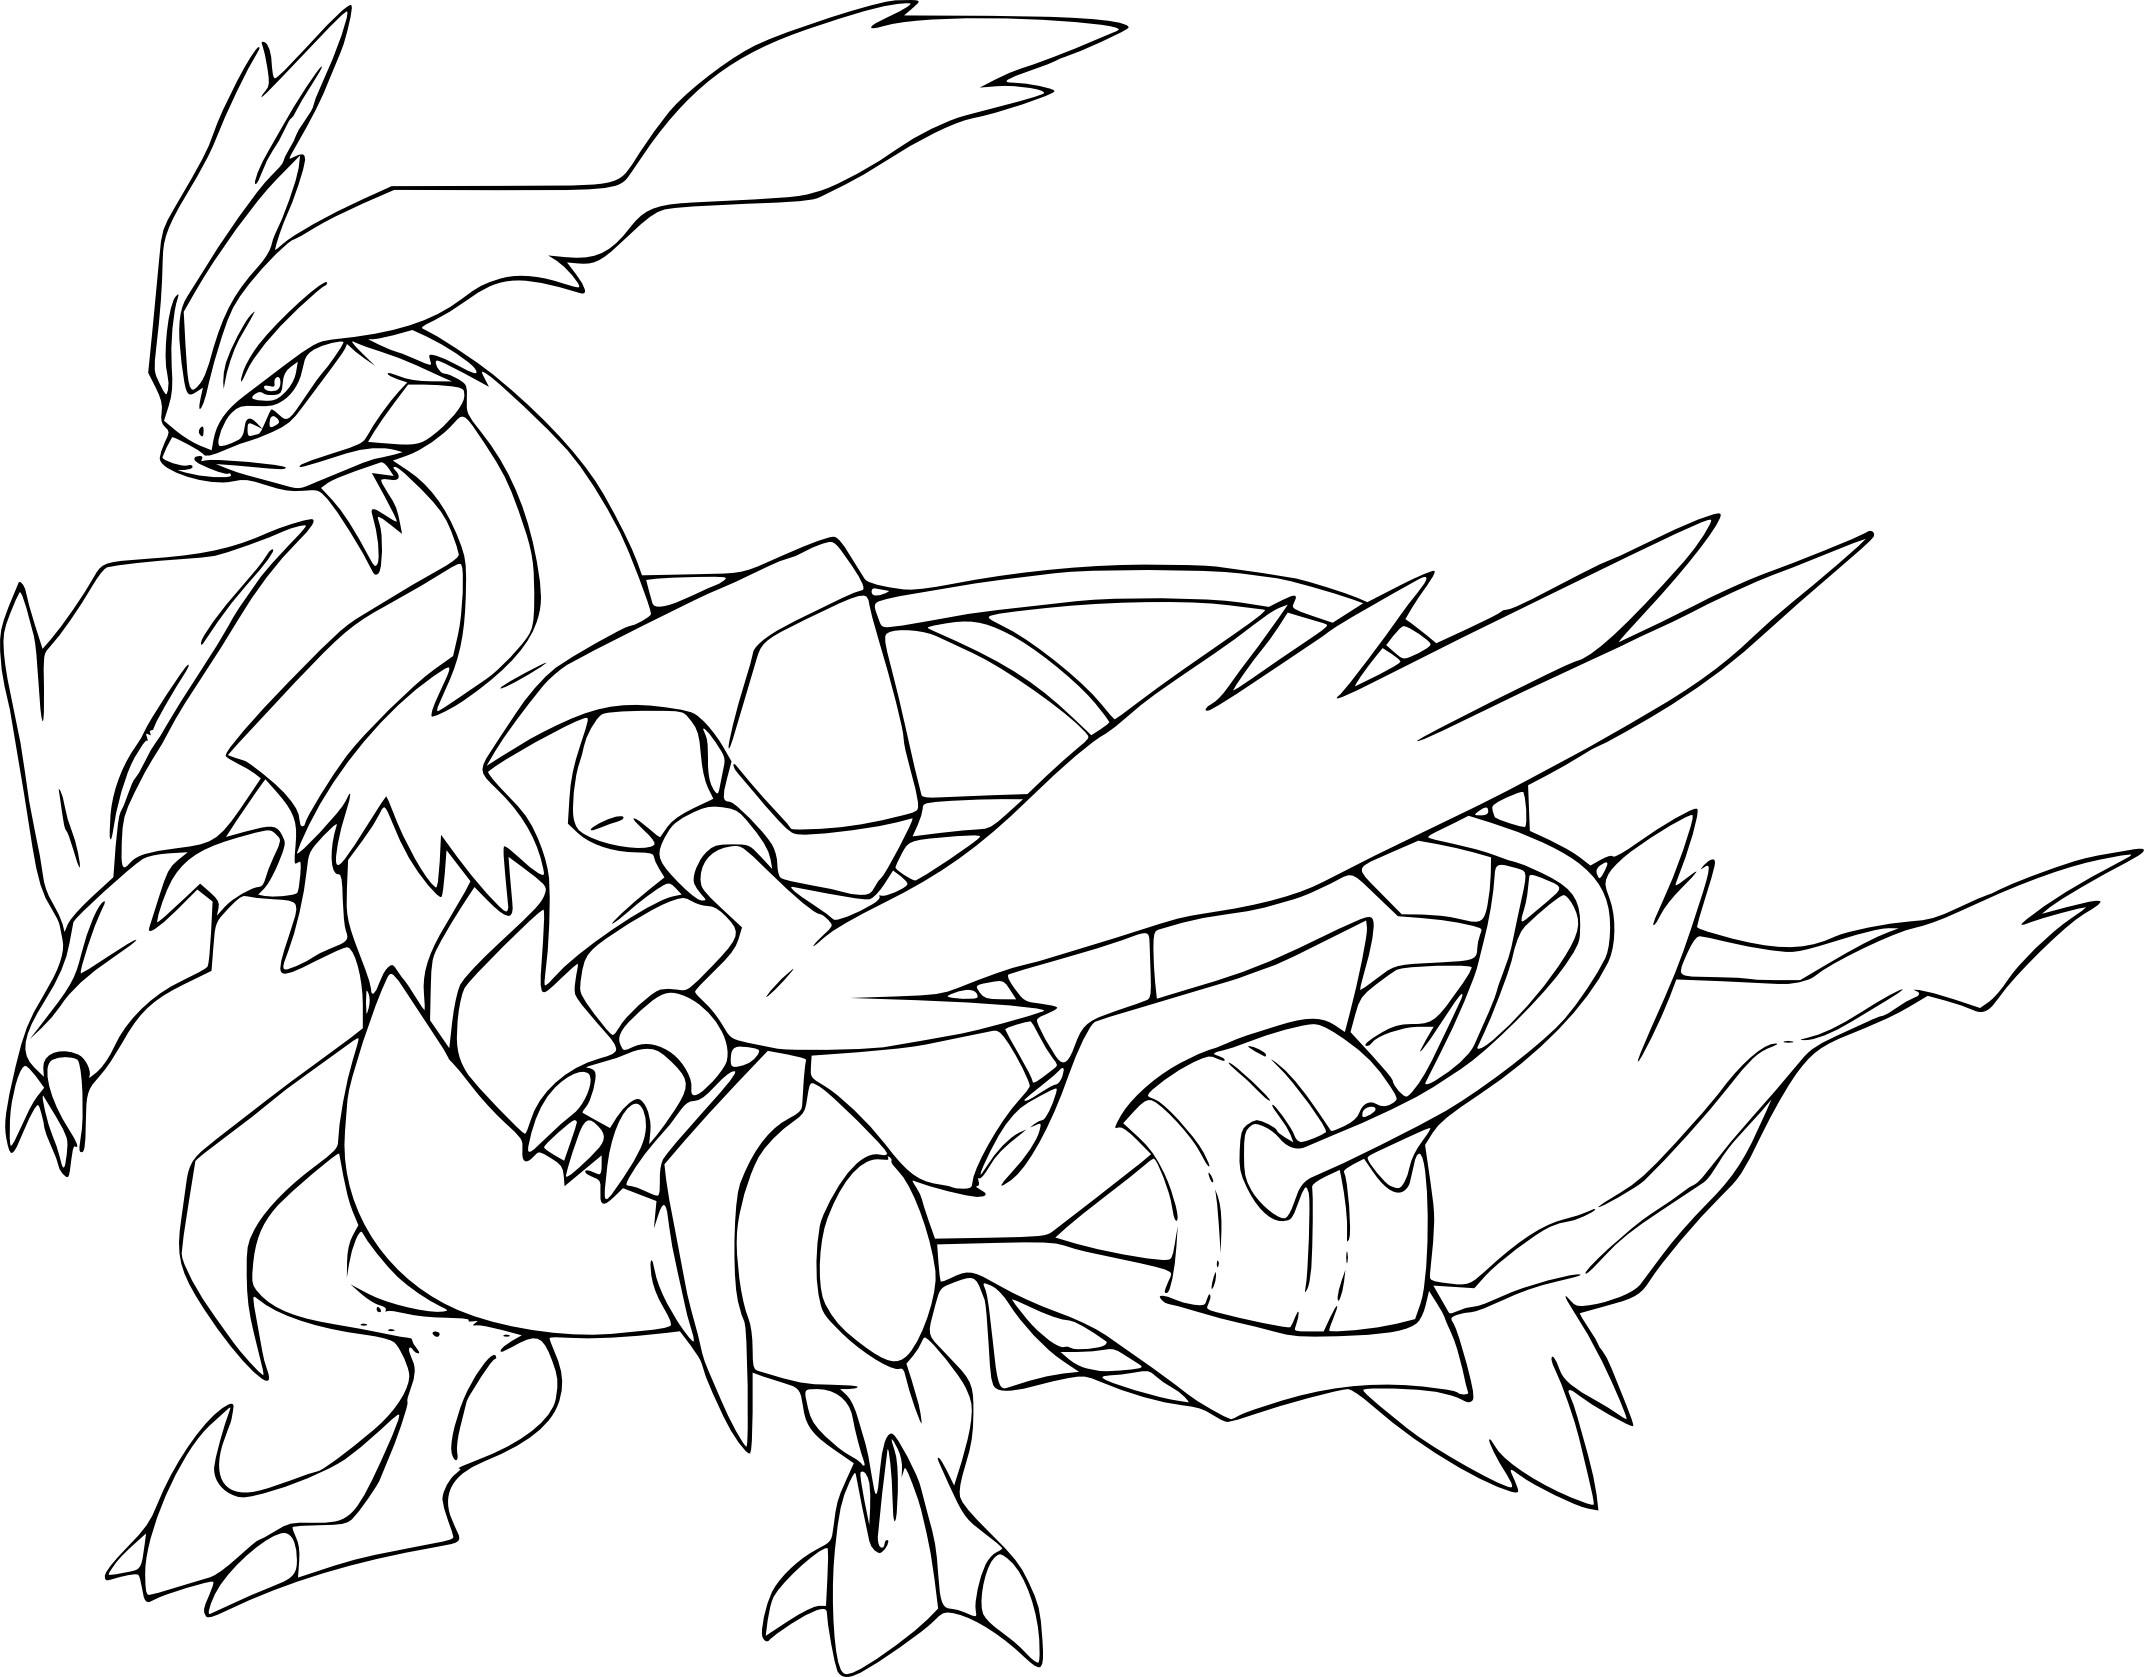 Coloriage Kyurem Blanc Pokemon À Imprimer tout Dessin Pokemon Reshiram